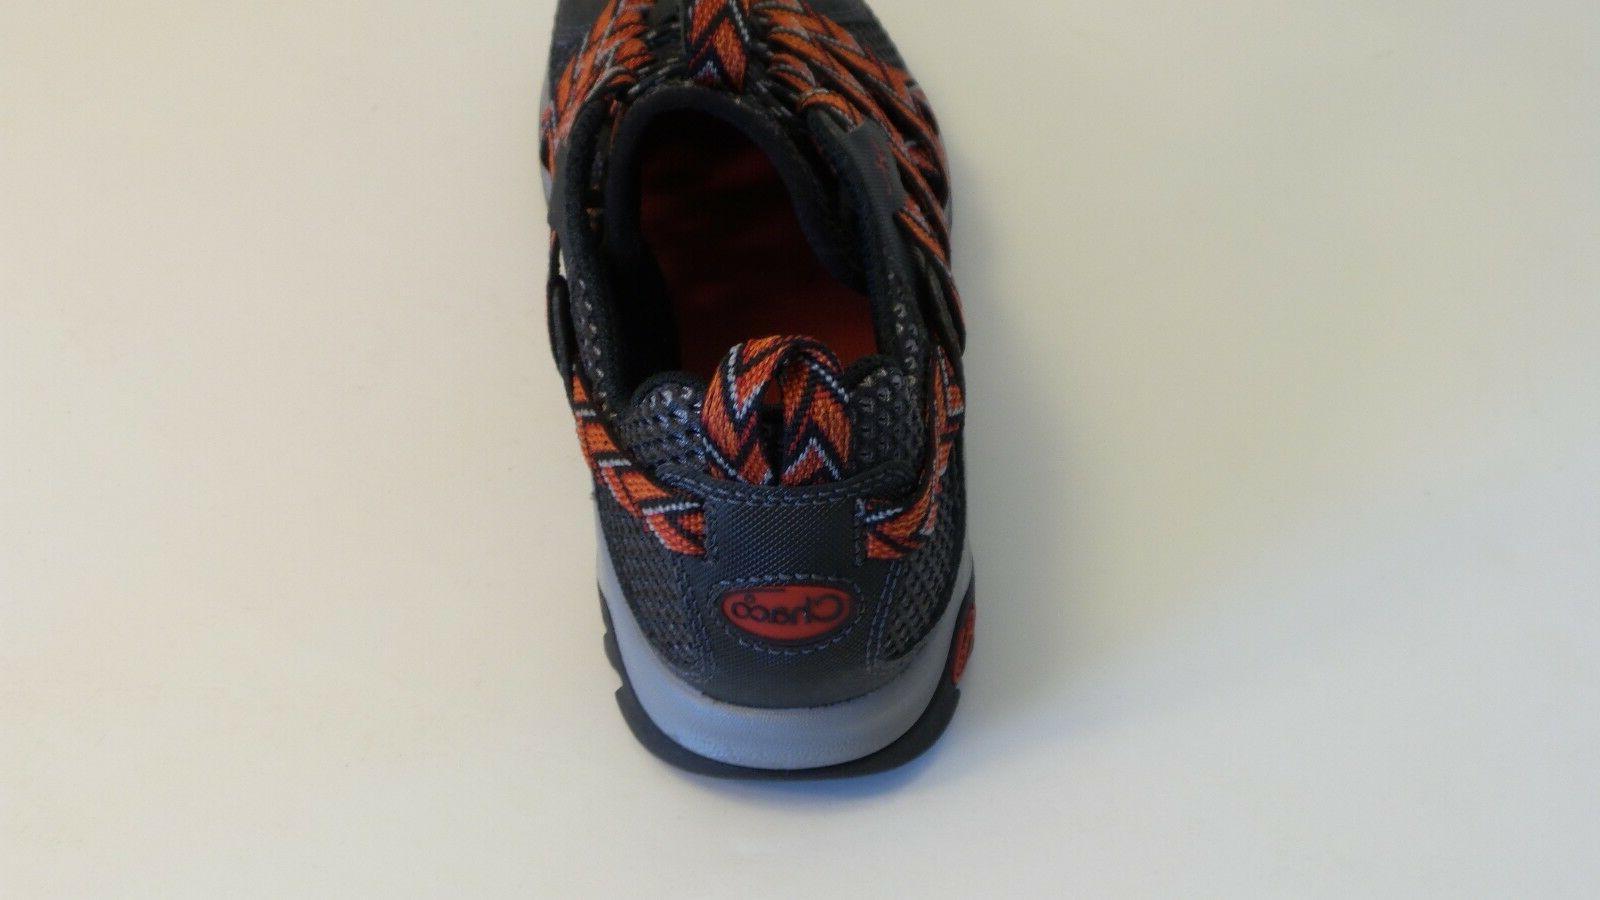 CM53 New Trail Water Beach Shoes 9 Black